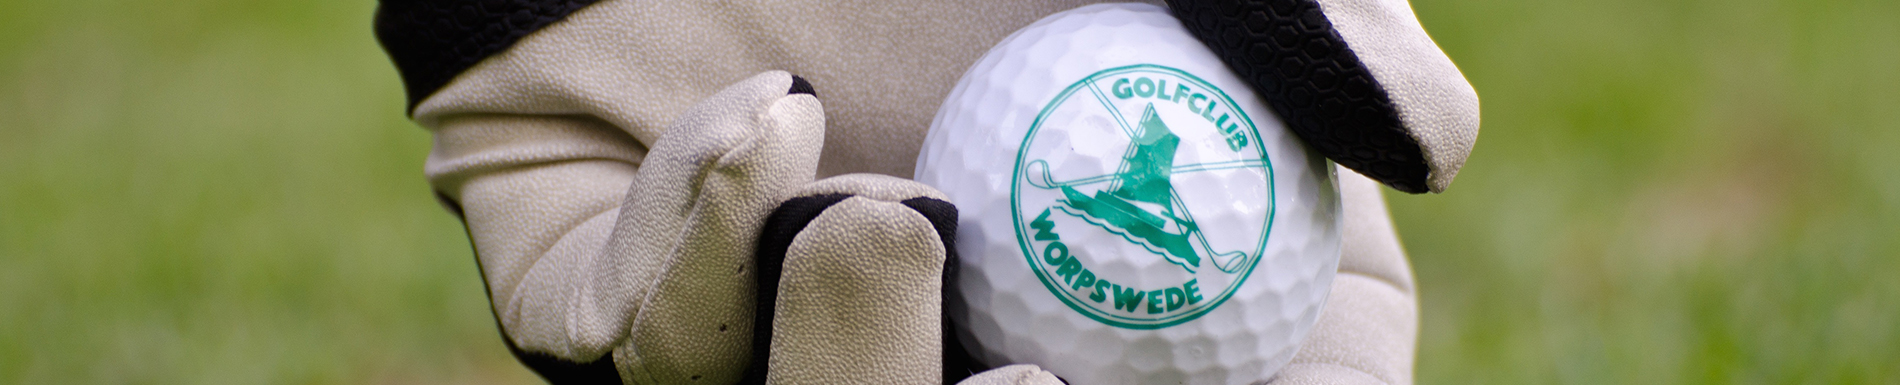 20130906_golfclub_worpswede-28-header